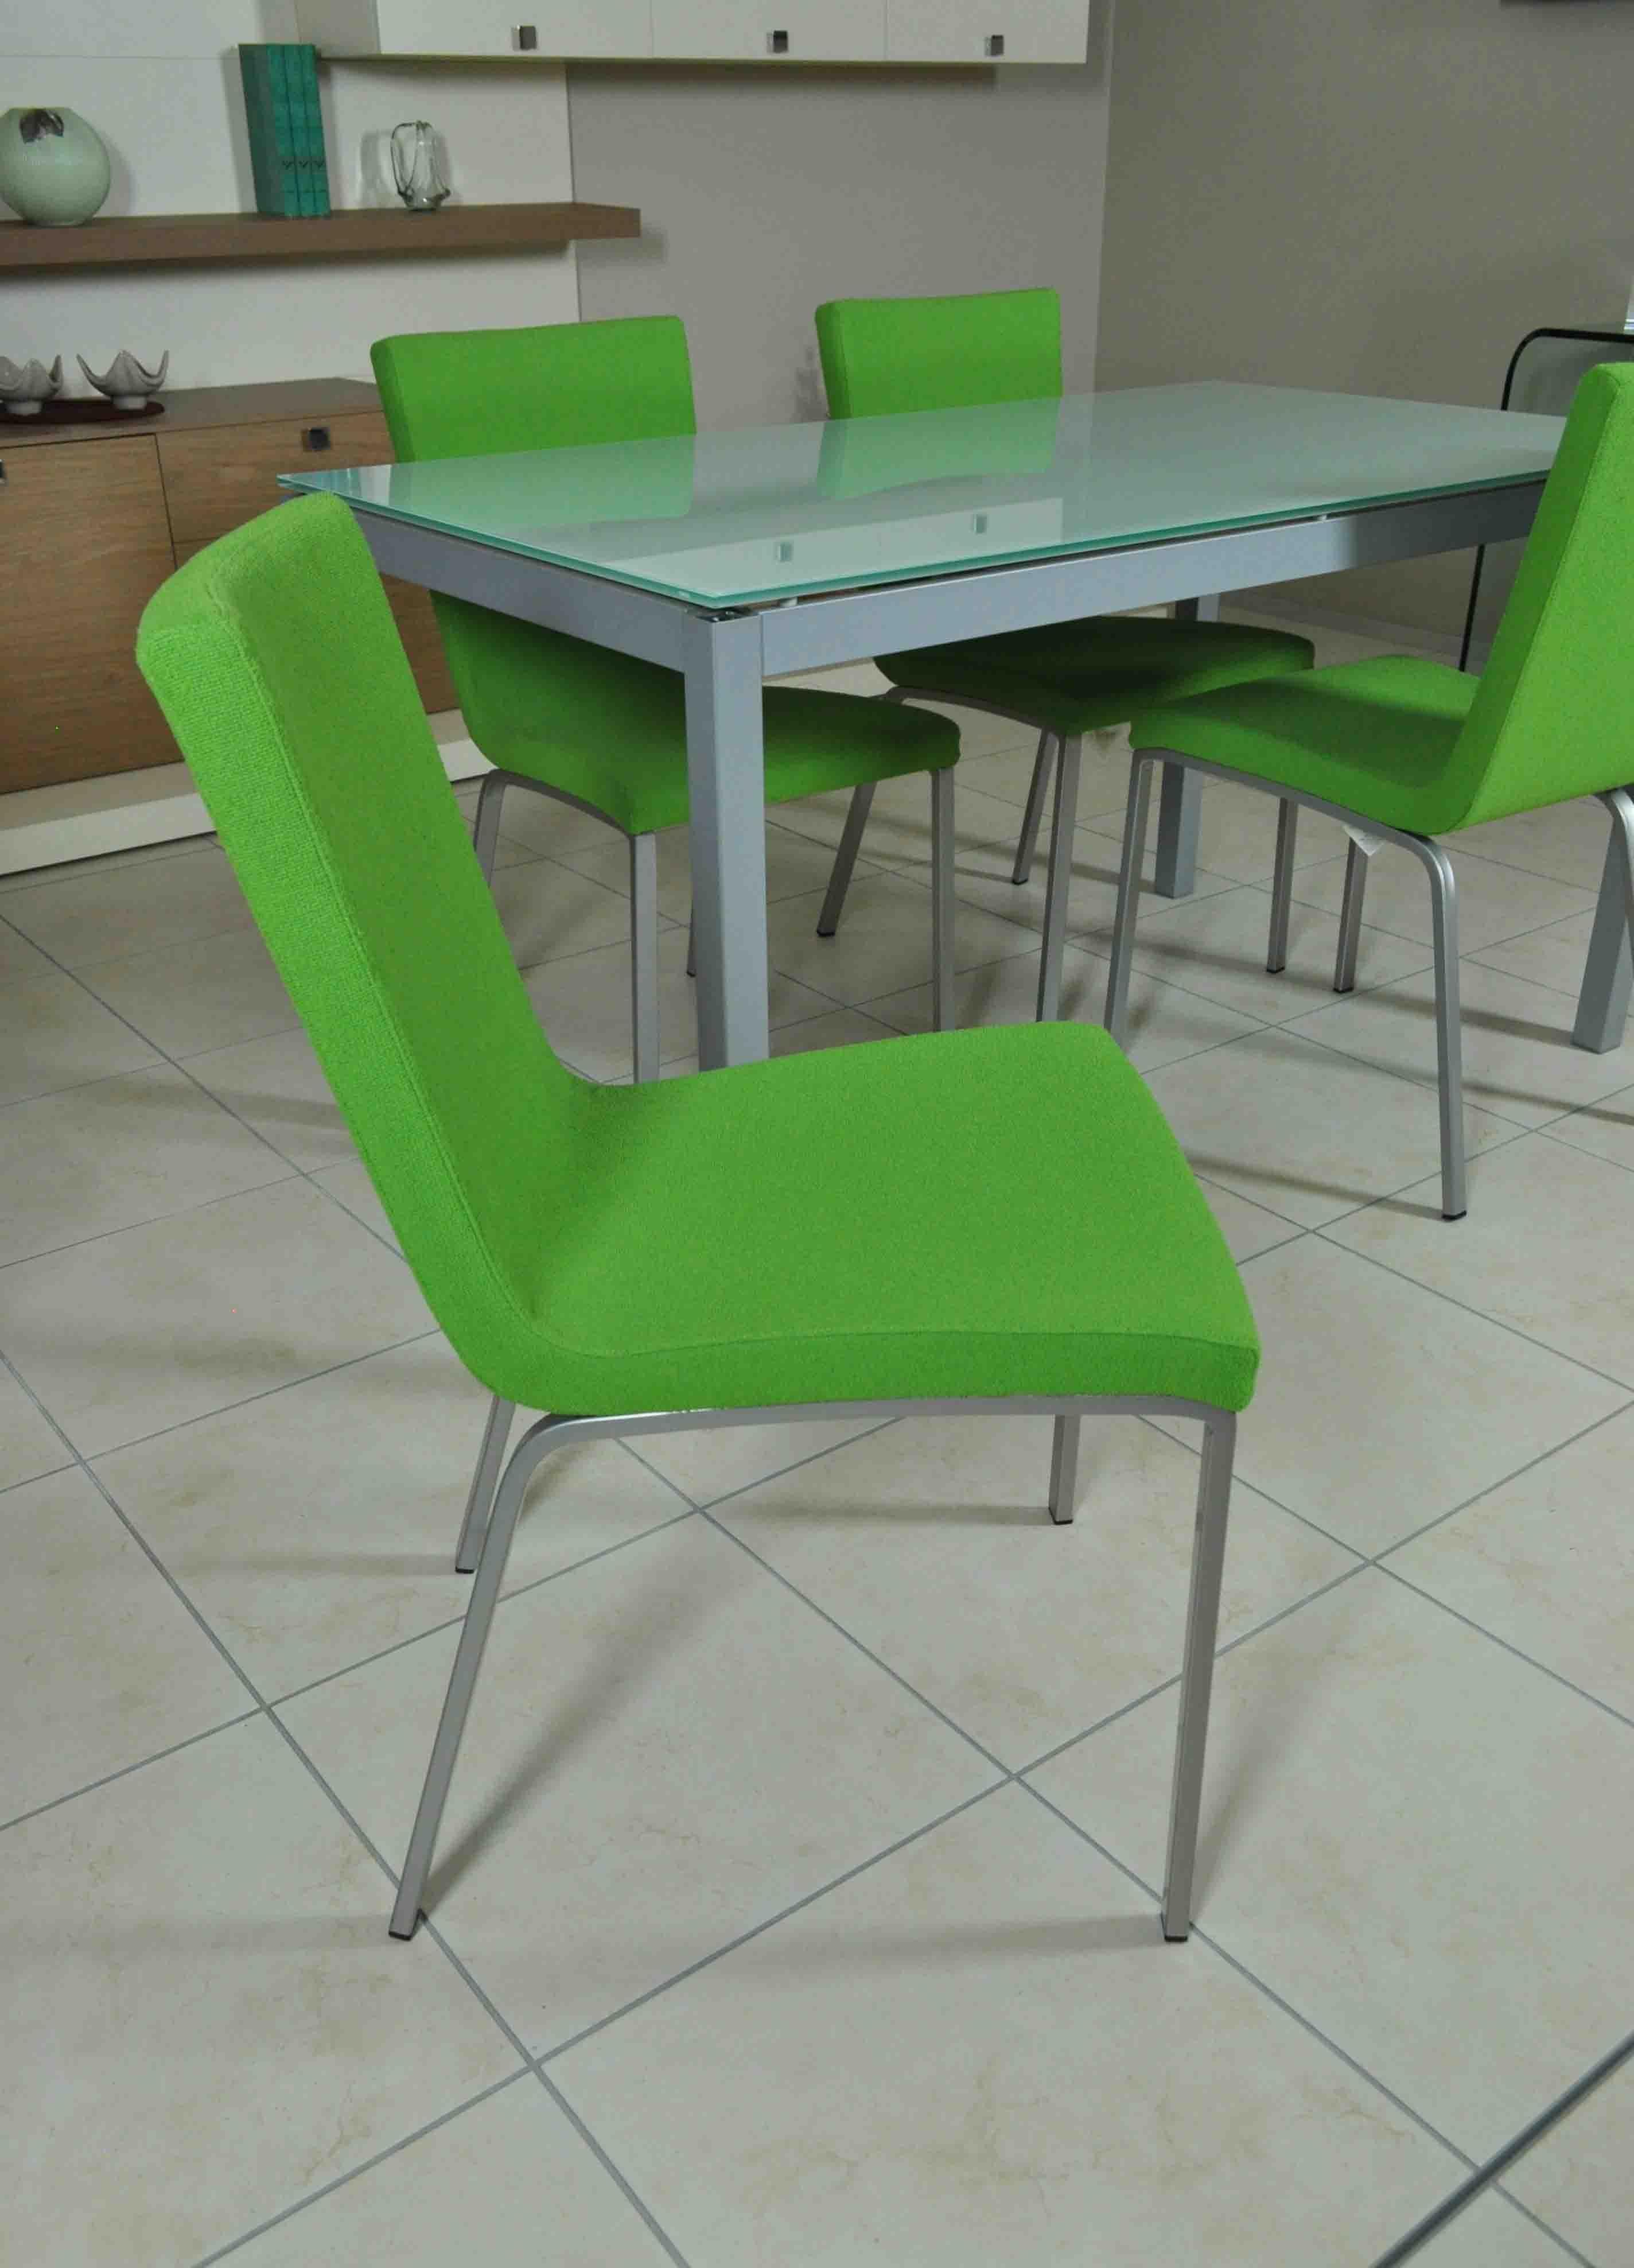 Emejing sedie imbottite prezzi images for Sedie imbottite mondo convenienza